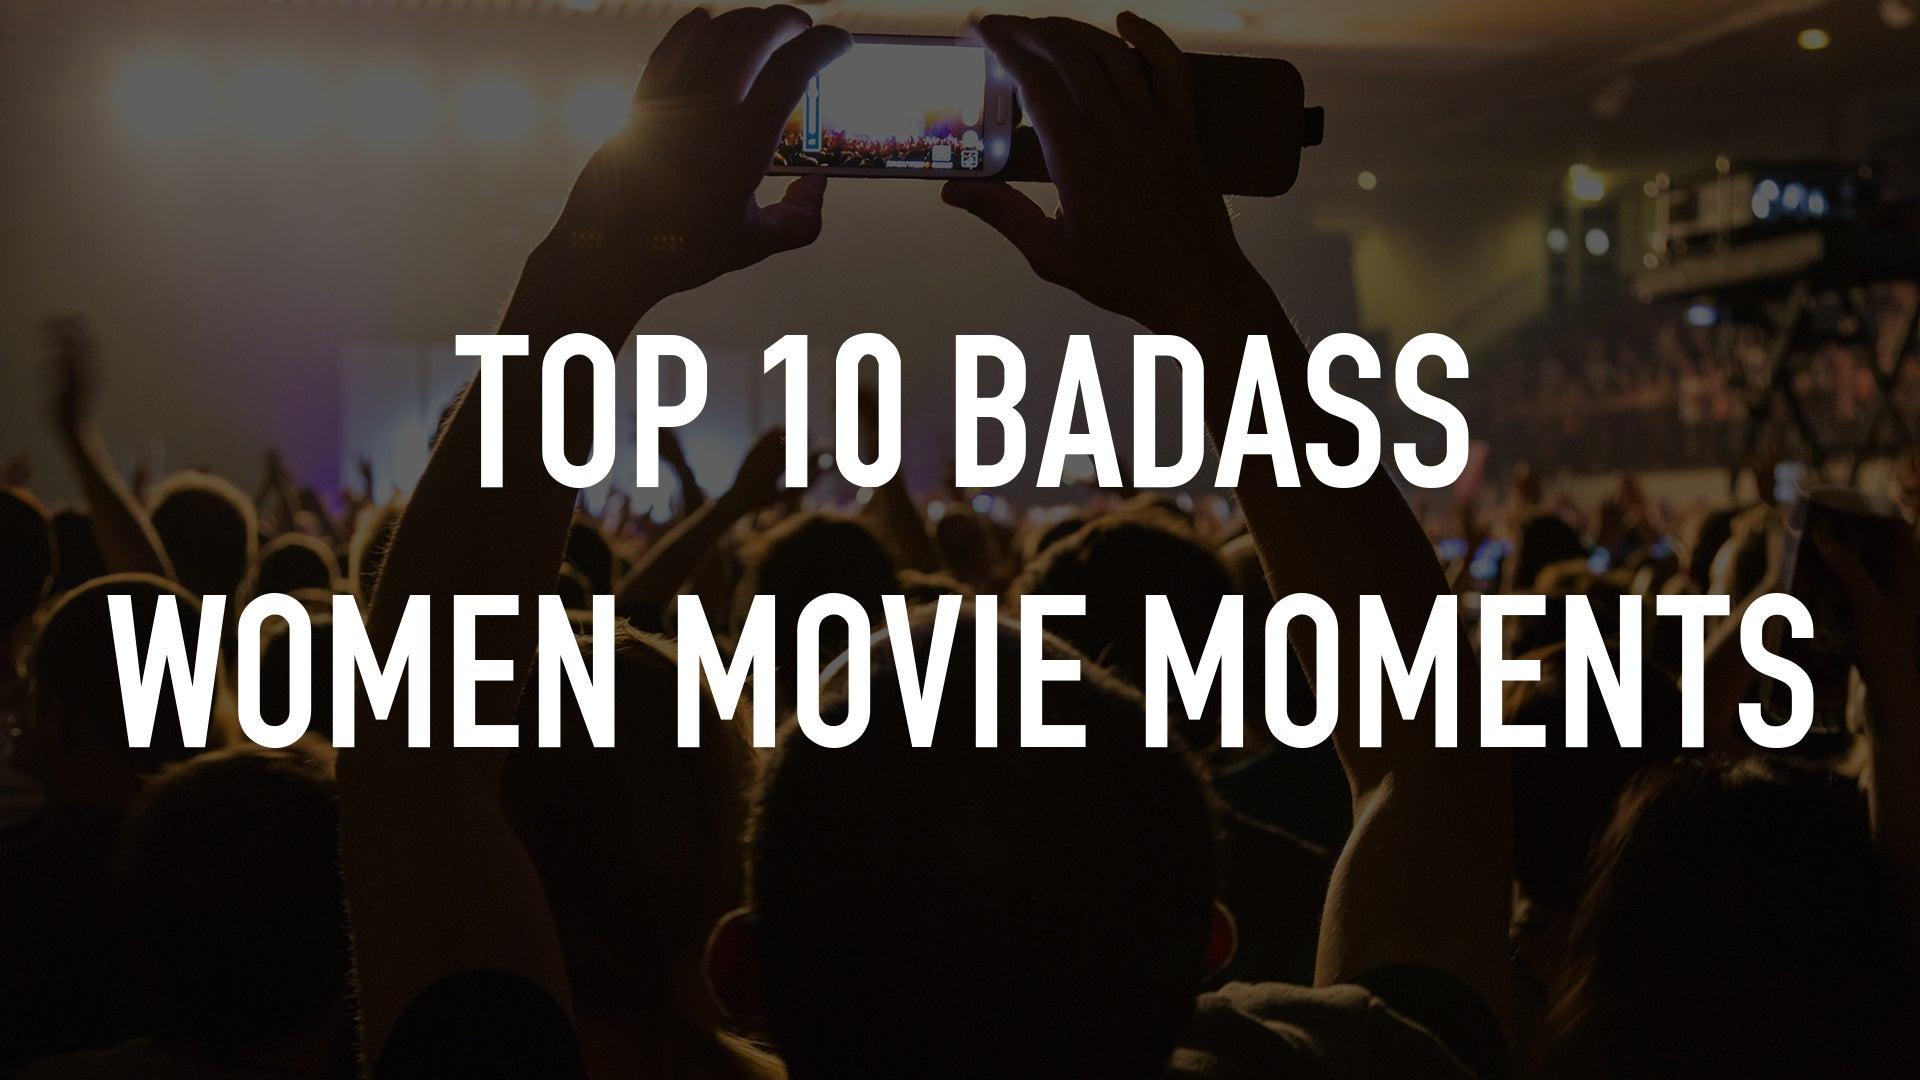 Top 10 Badass Women Movie Moments